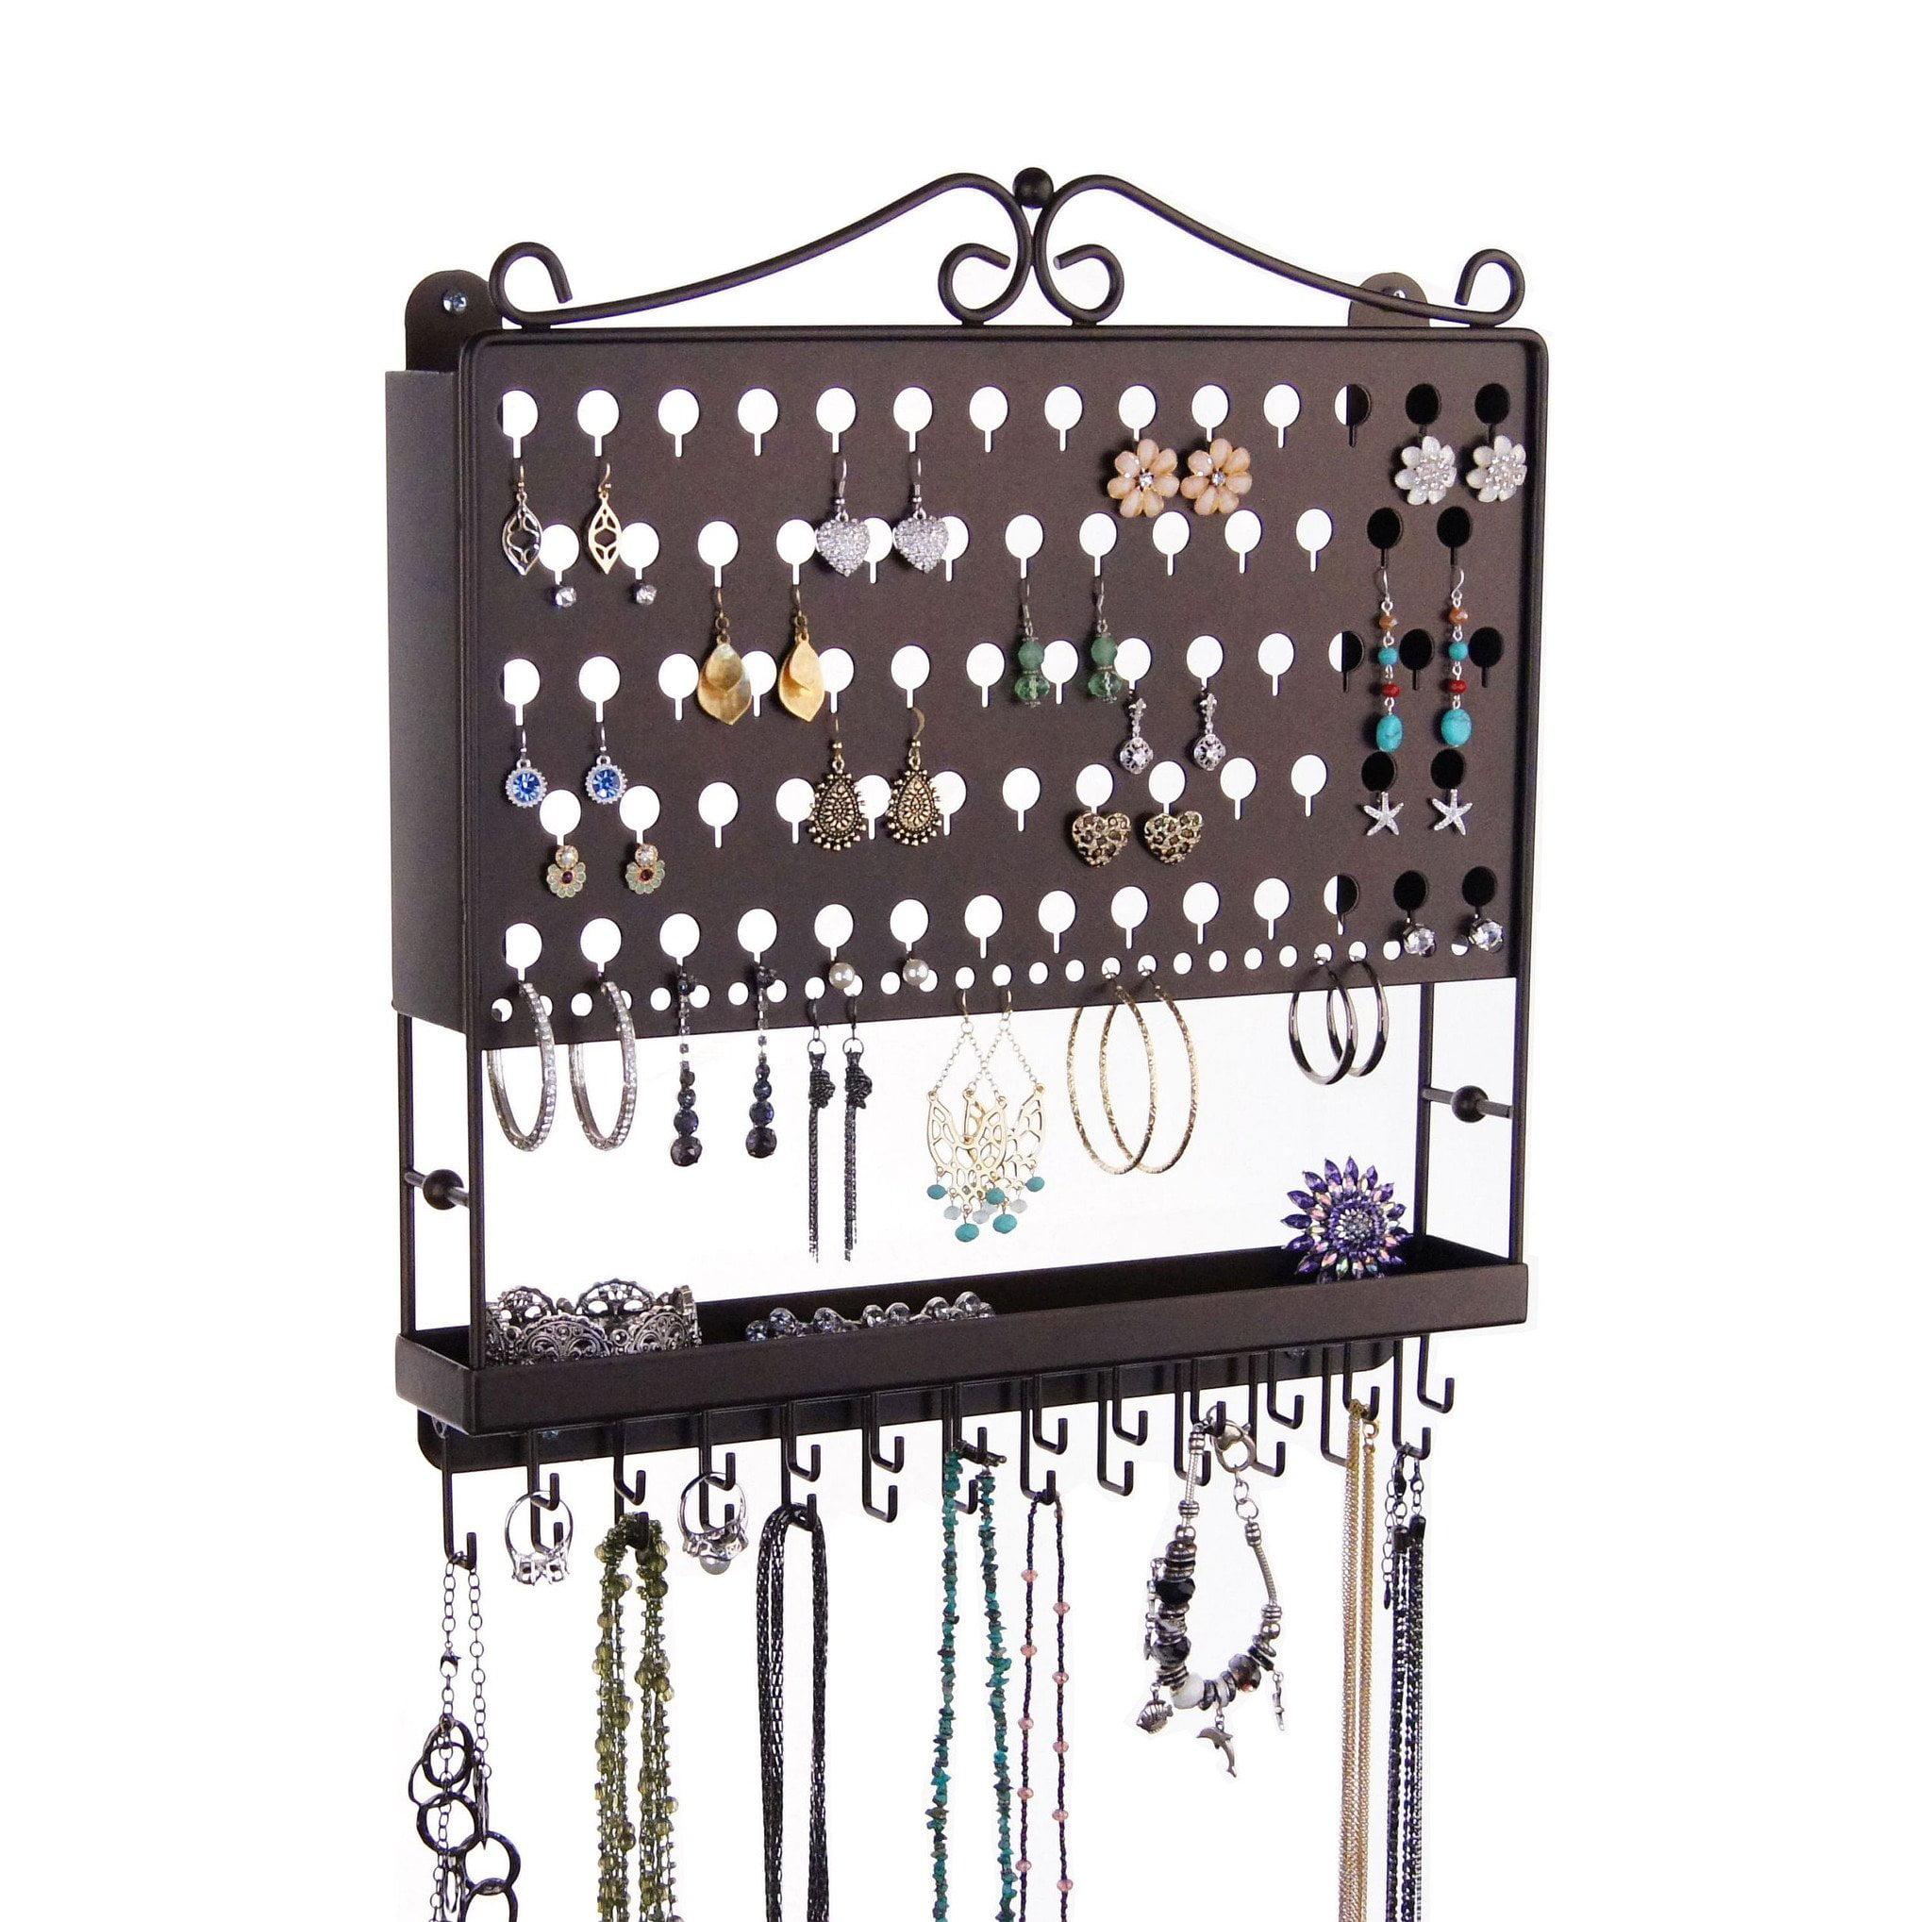 Angelynn S Stud Dangle Earring Holder Wall Mount Hanging Necklace Rack Jewelry Organizer Display Closet Jewelry Storage Tray Rubbed Bronze Walmart Com Walmart Com